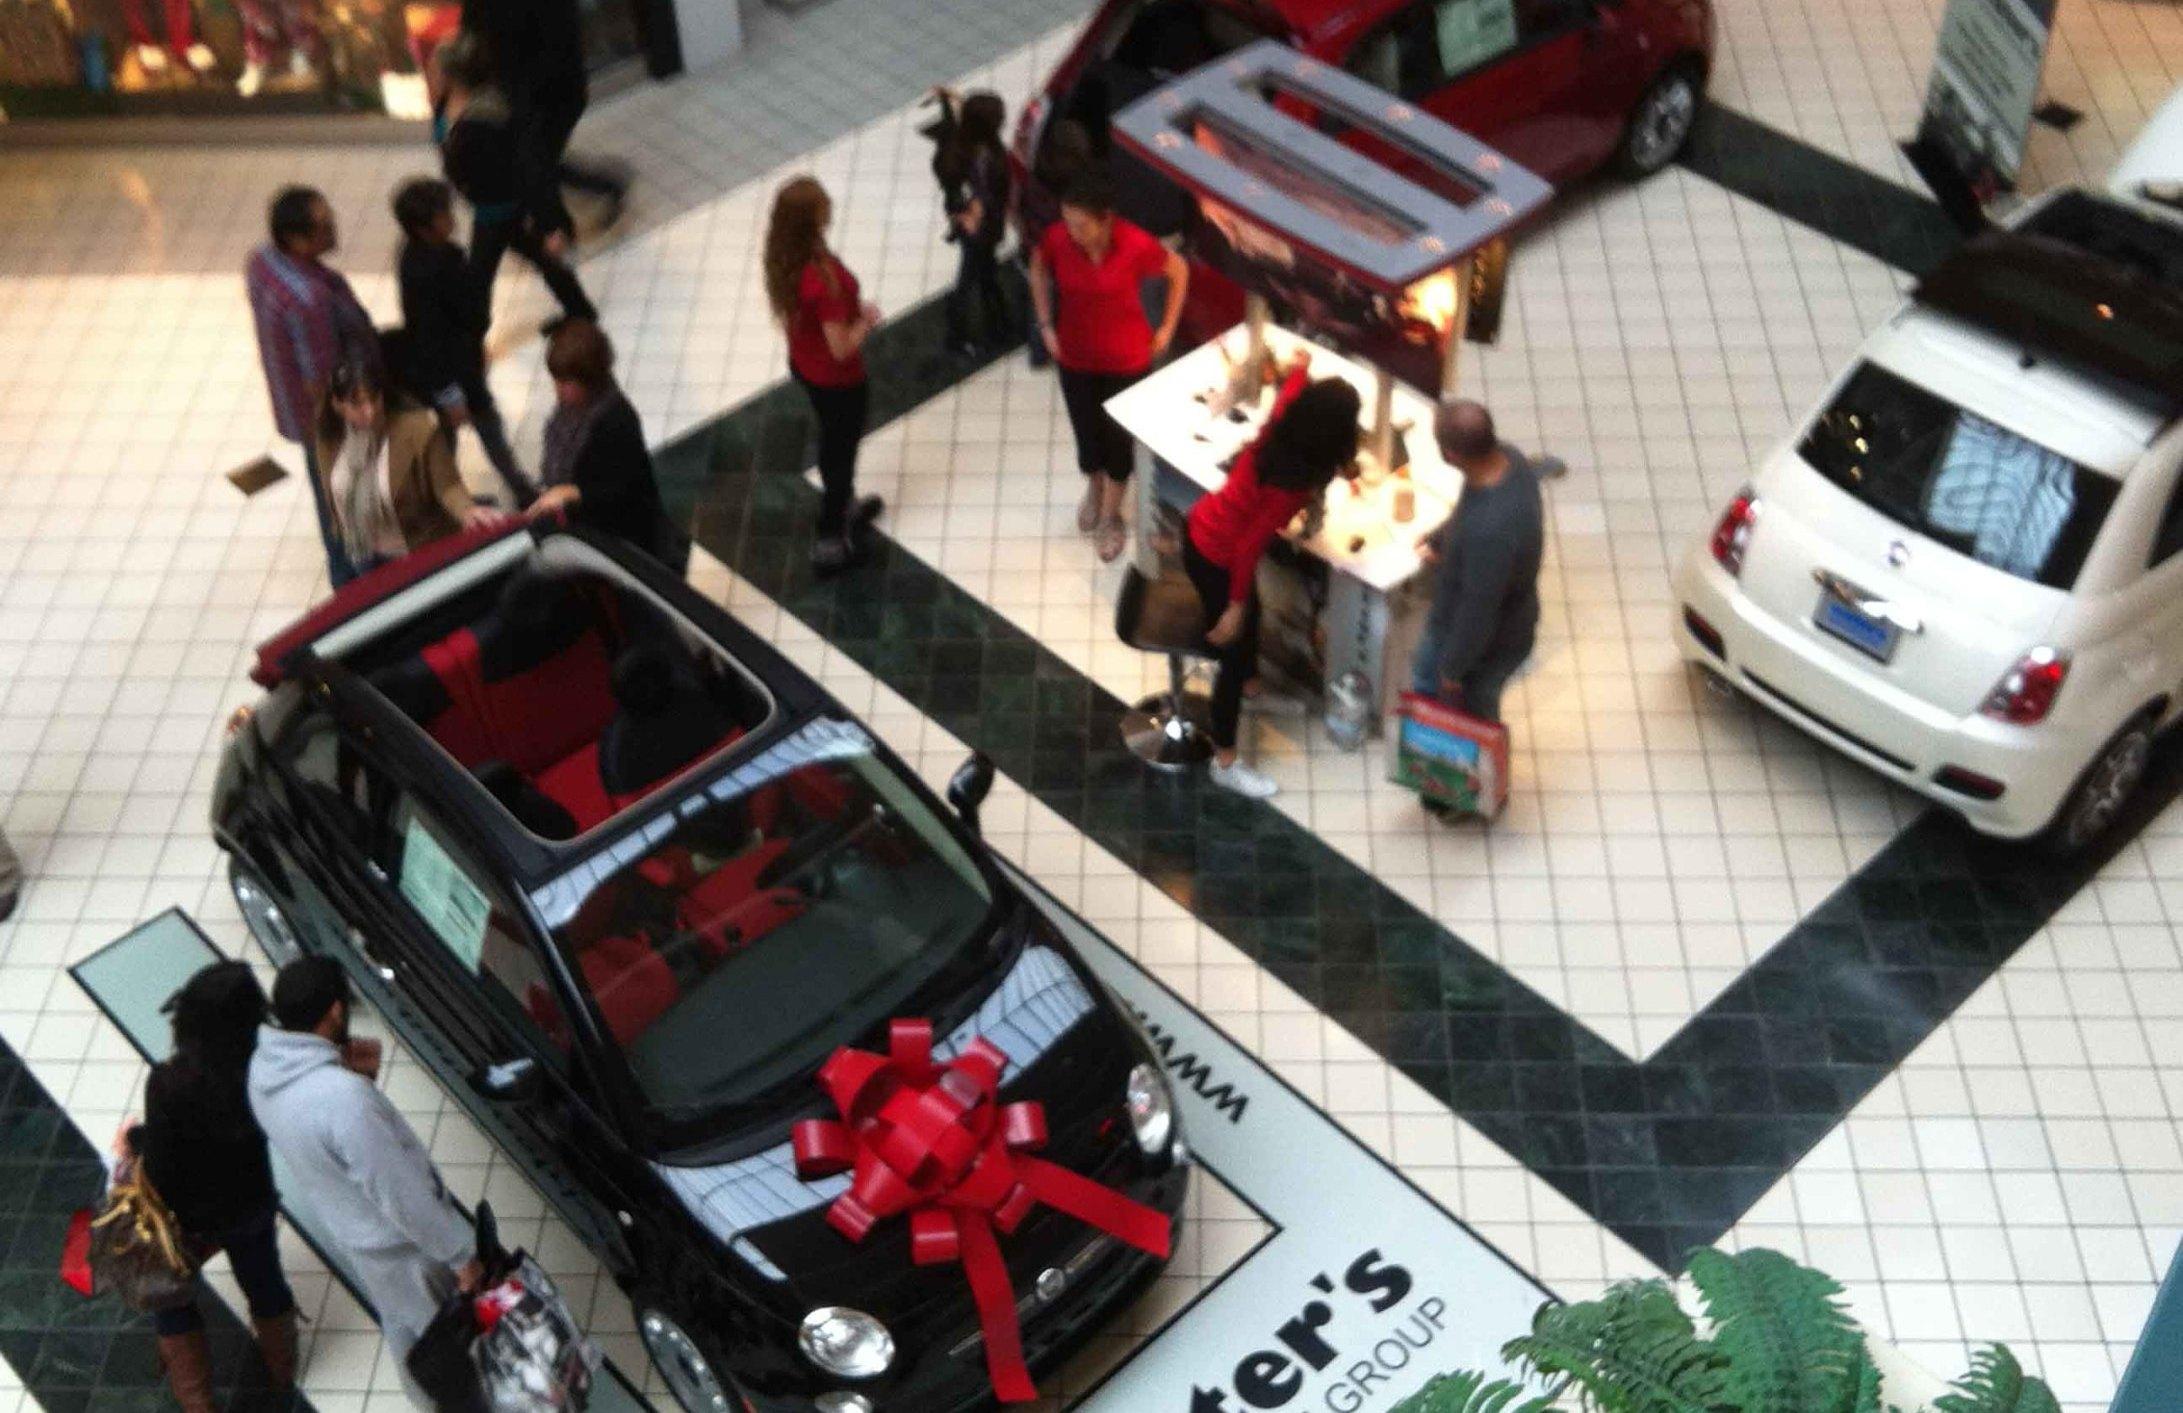 Fiat at Galleria of Riverside